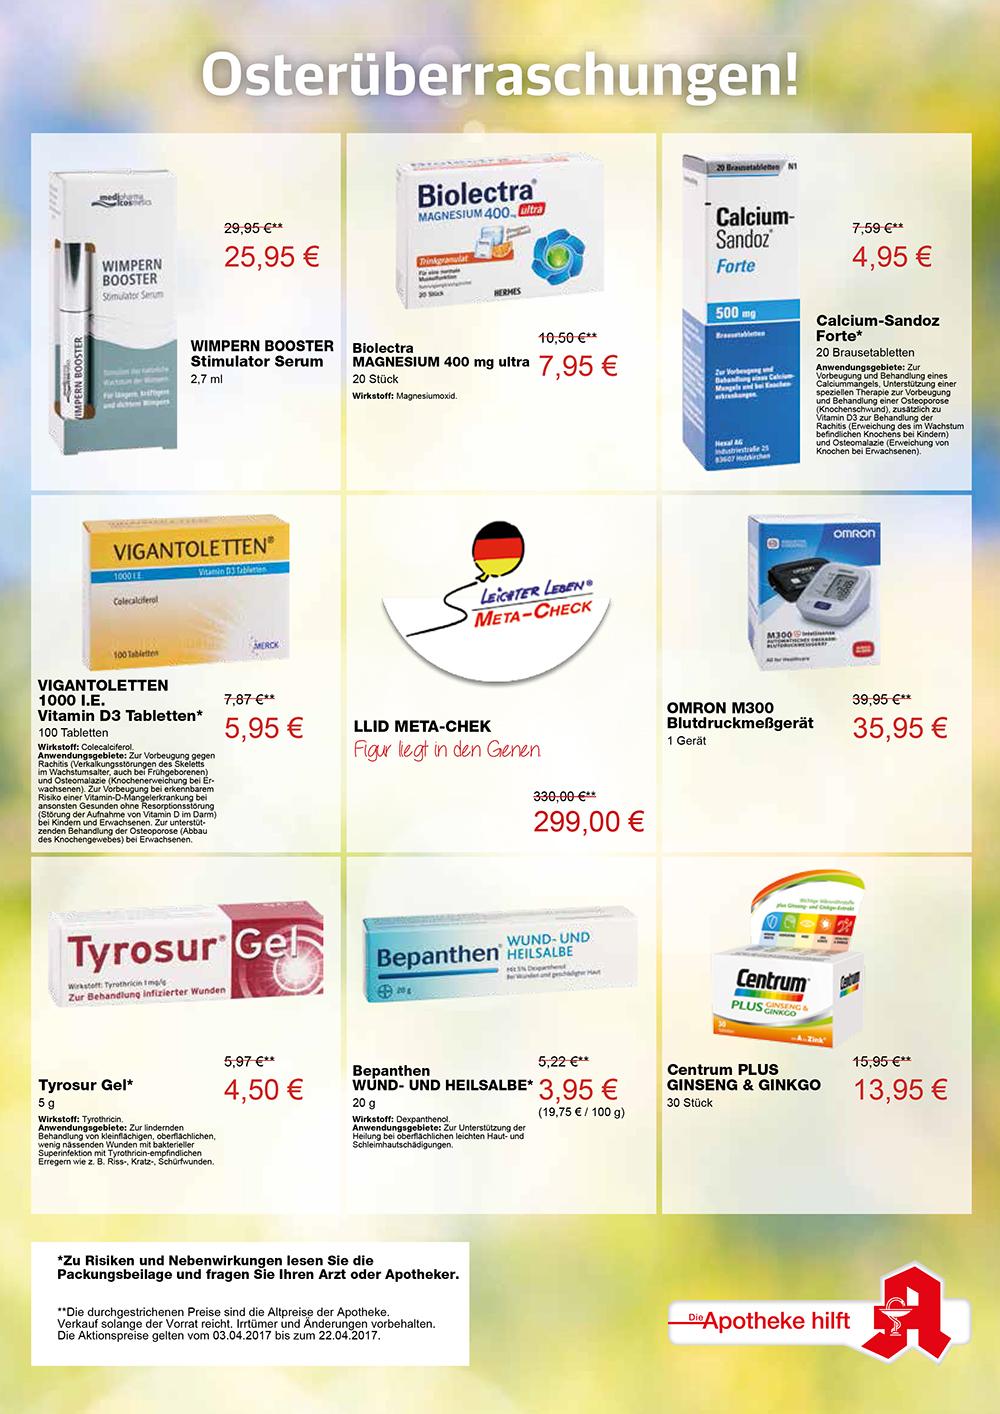 http://www.apotheken.de/fileadmin/clubarea/00000-Angebote/50226_hirsch_angebot_2.jpg